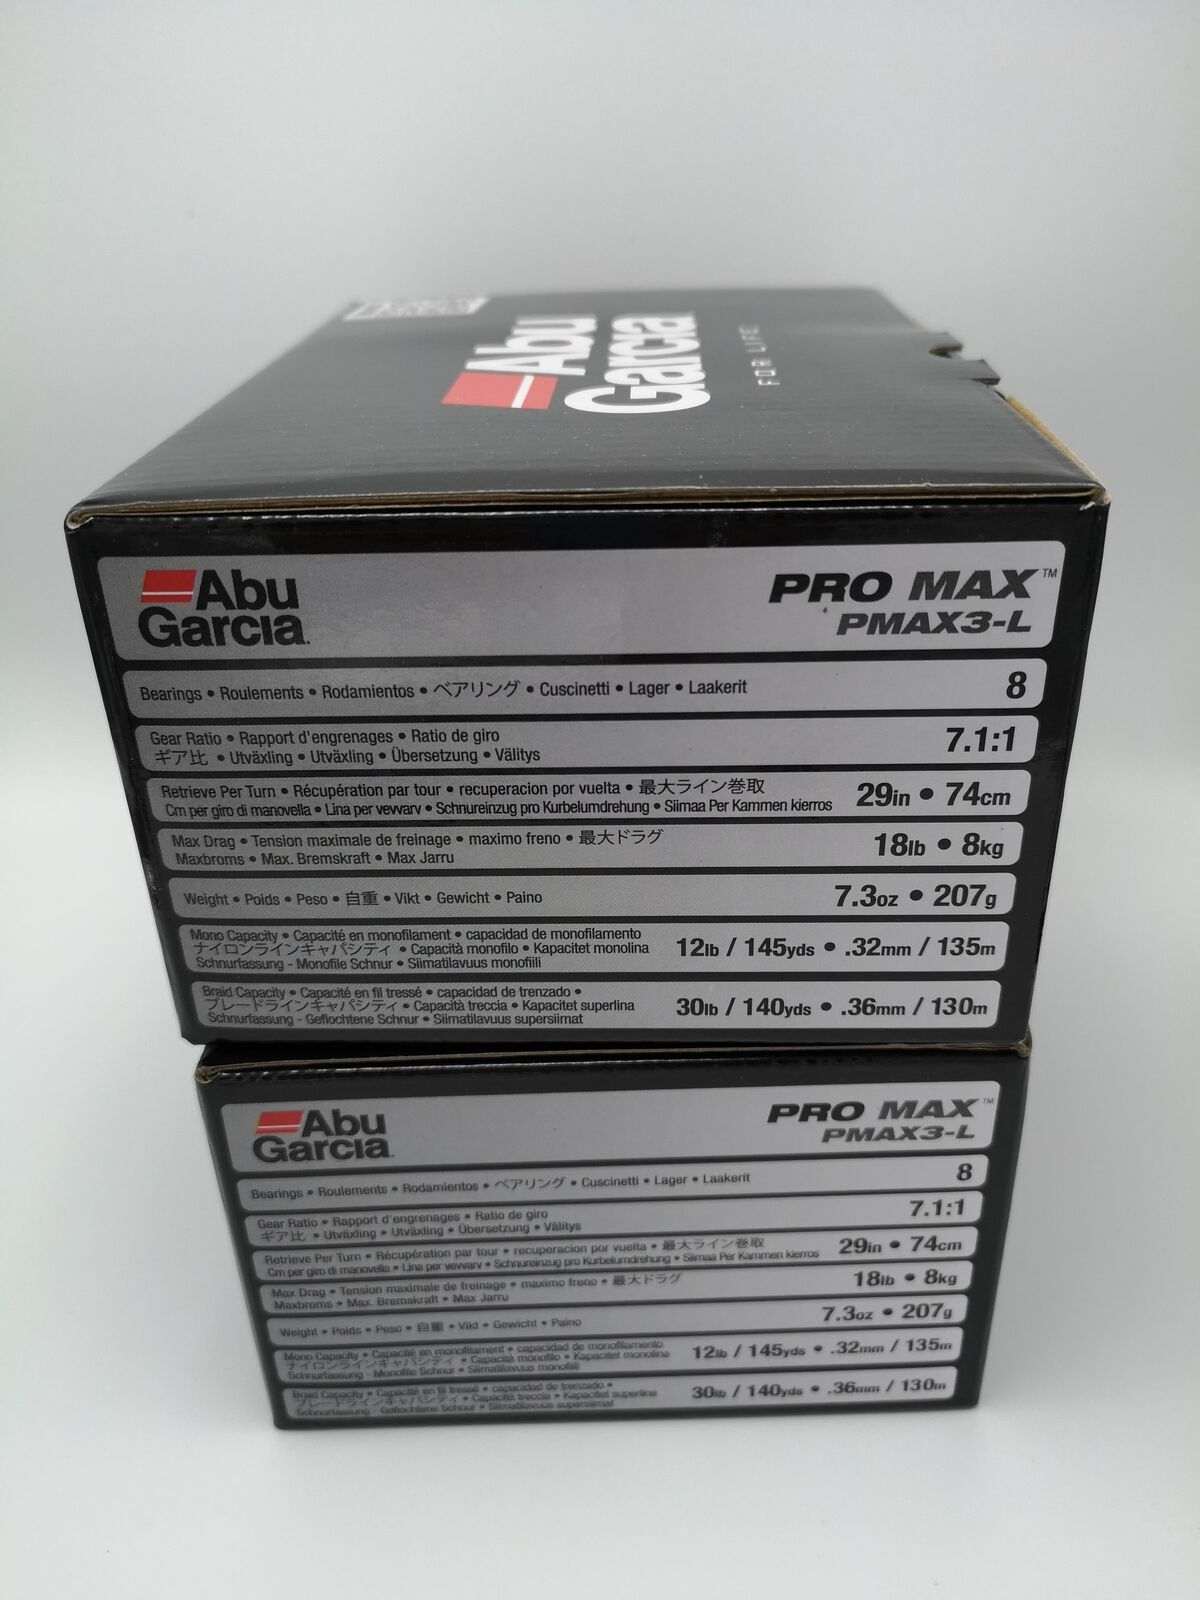 Lot of 2 Abu Garcia PMAX3L LeftHanded Pro max Low Profile Baitcasting Reel